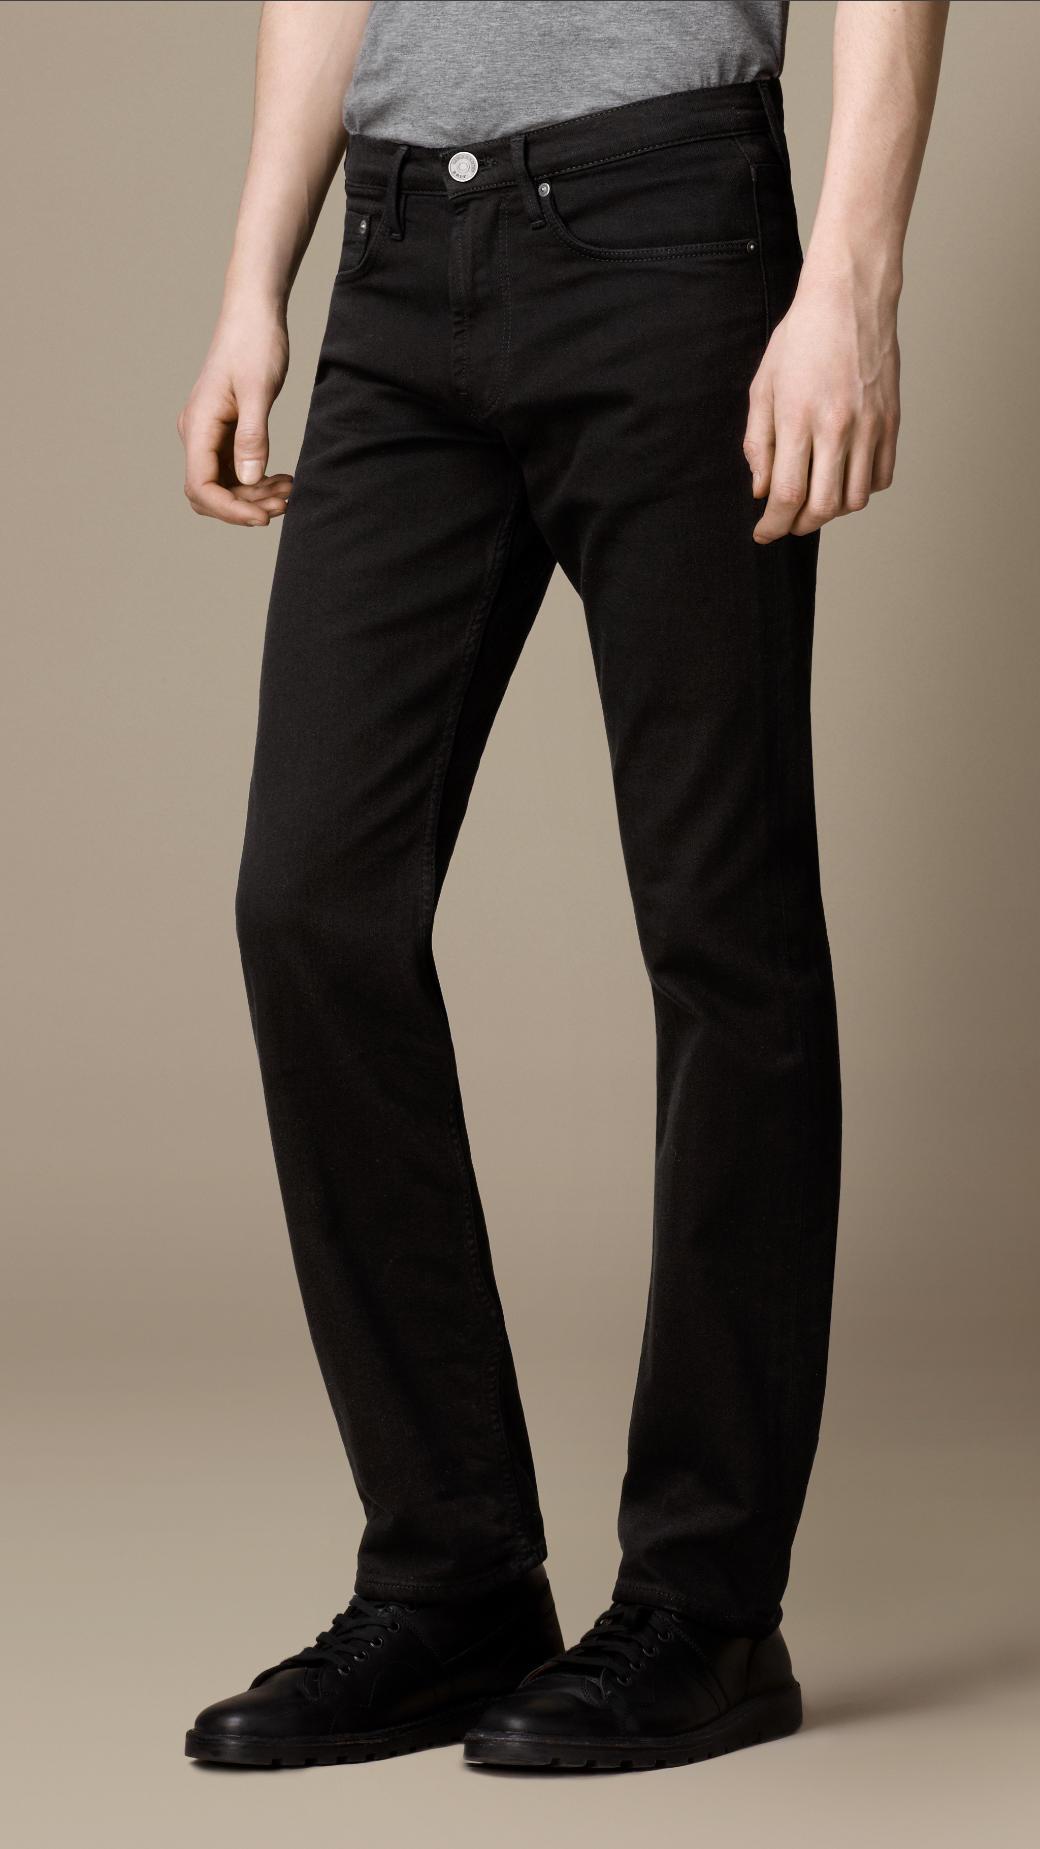 42ec9573ec5 Burberry Cavendish Black Rinse Straight Fit Jeans in Black for Men ...